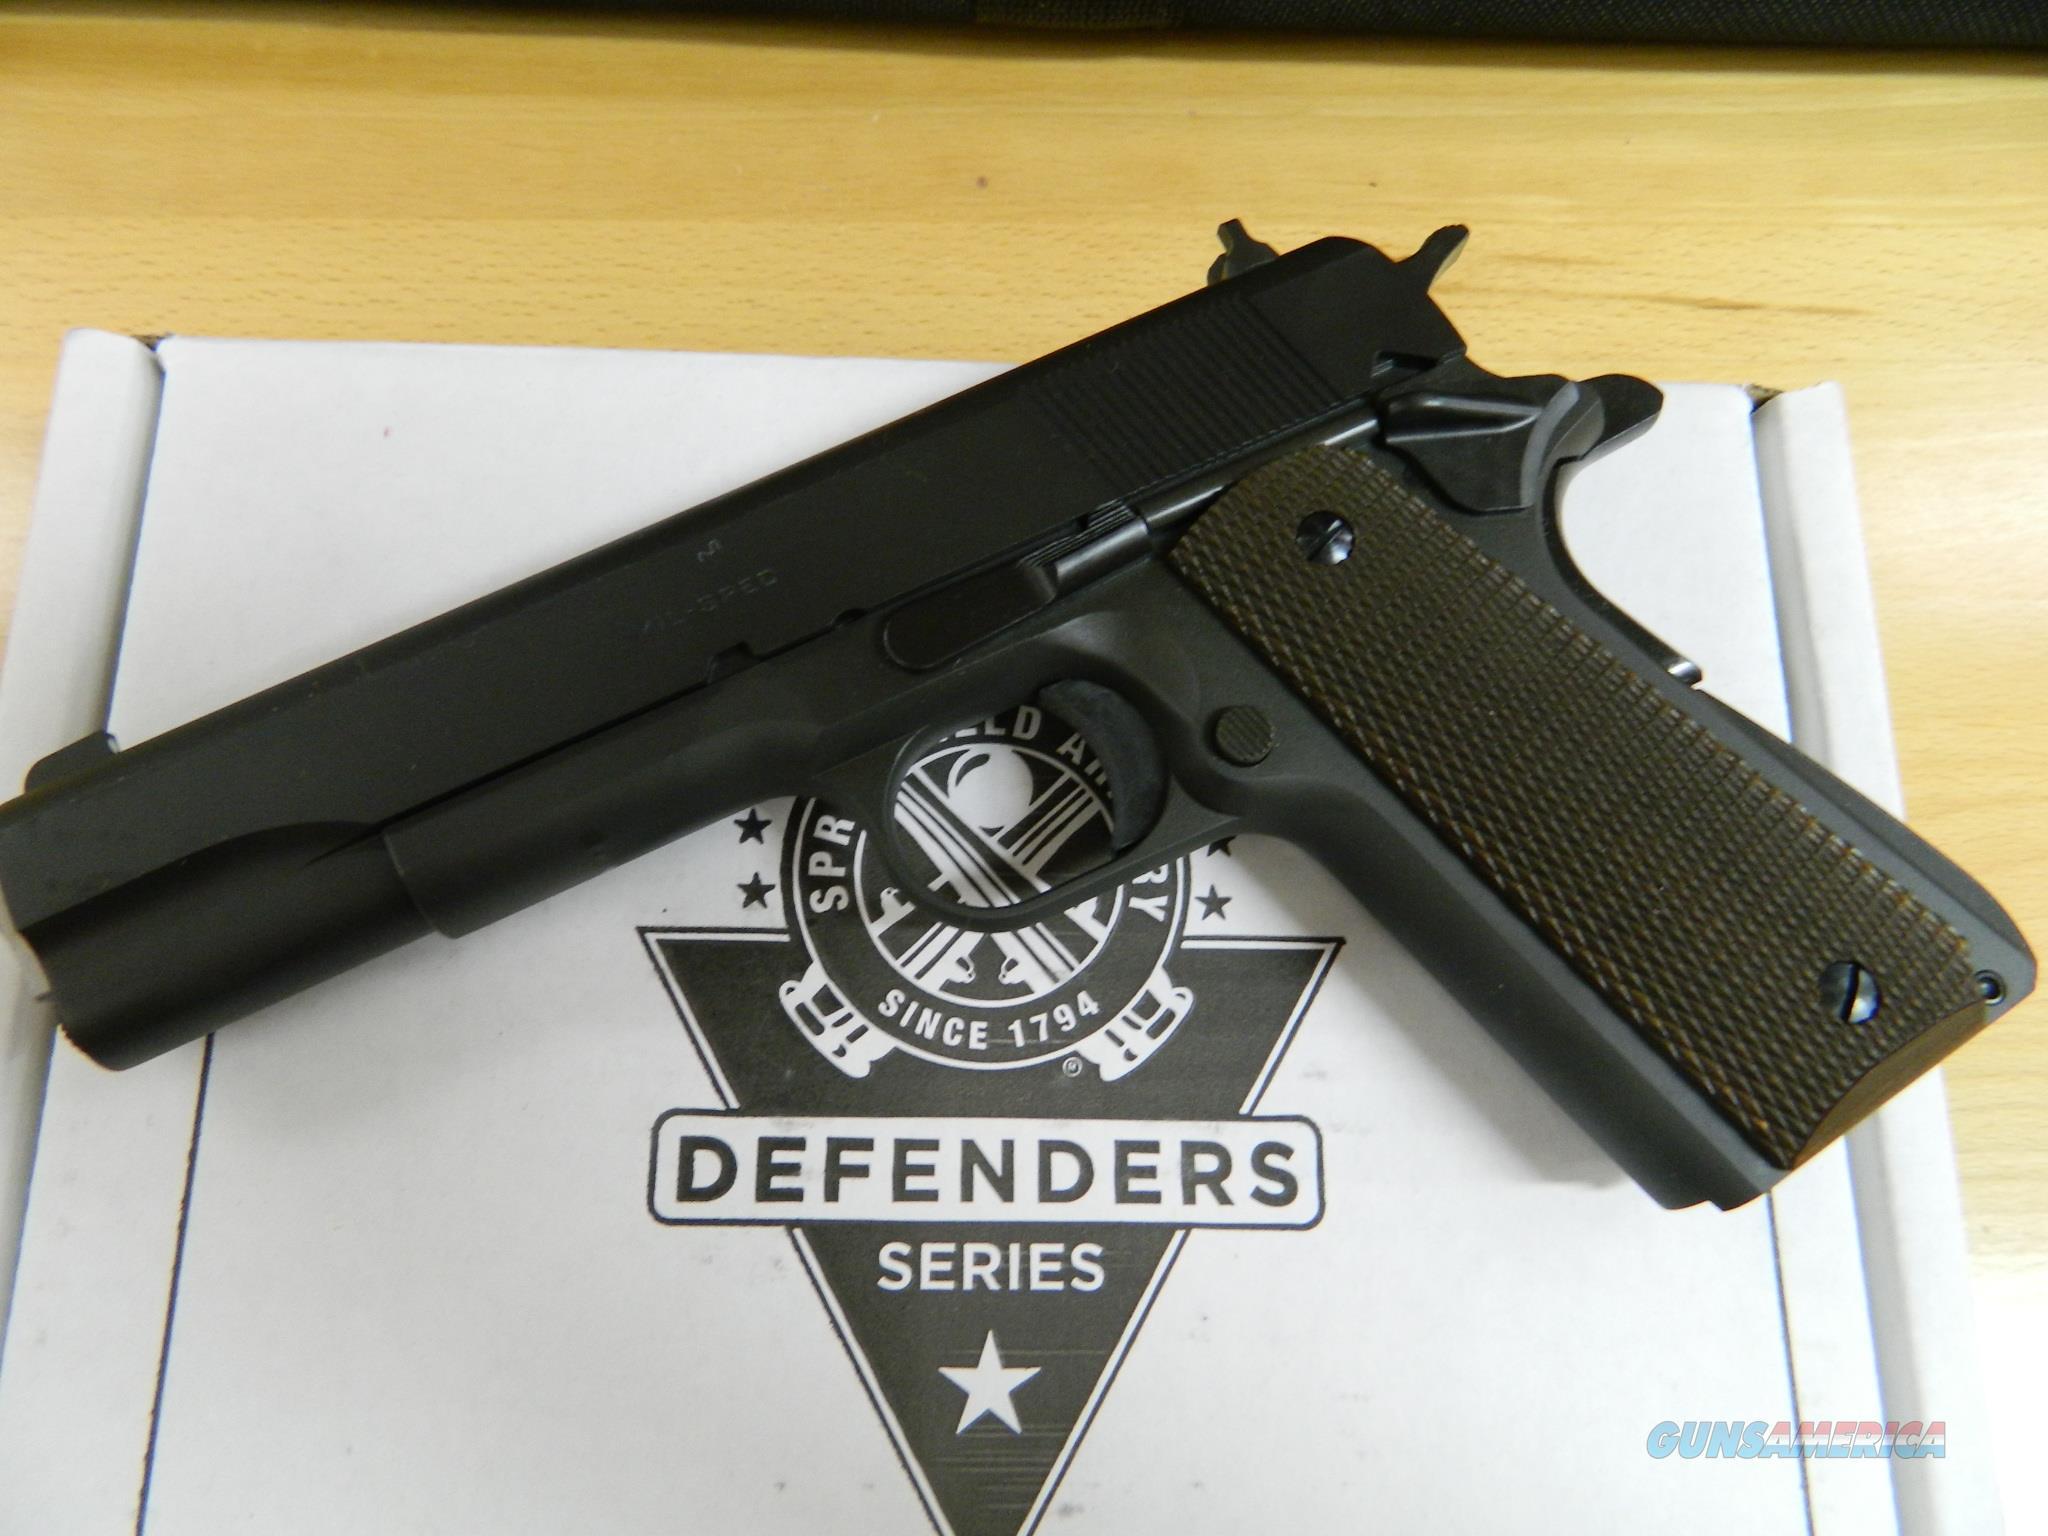 Springfield 1911 Mil-Spec Defender .45 ACP NIB  Guns > Pistols > Springfield Armory Pistols > 1911 Type